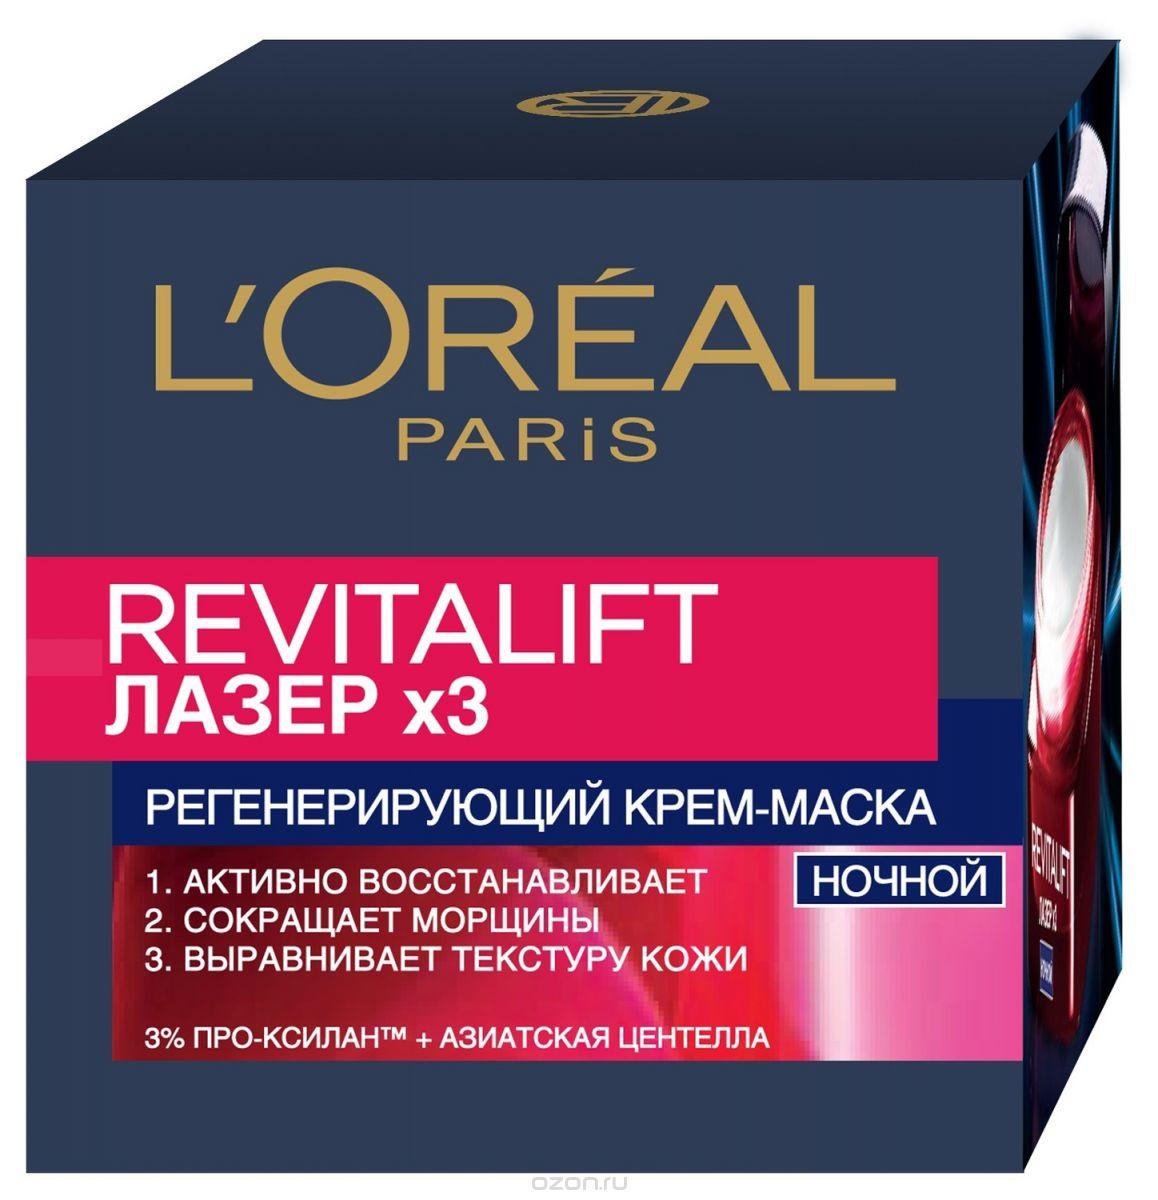 L`Oreal Revitalift Лазер Х3 Ночная крем-маска